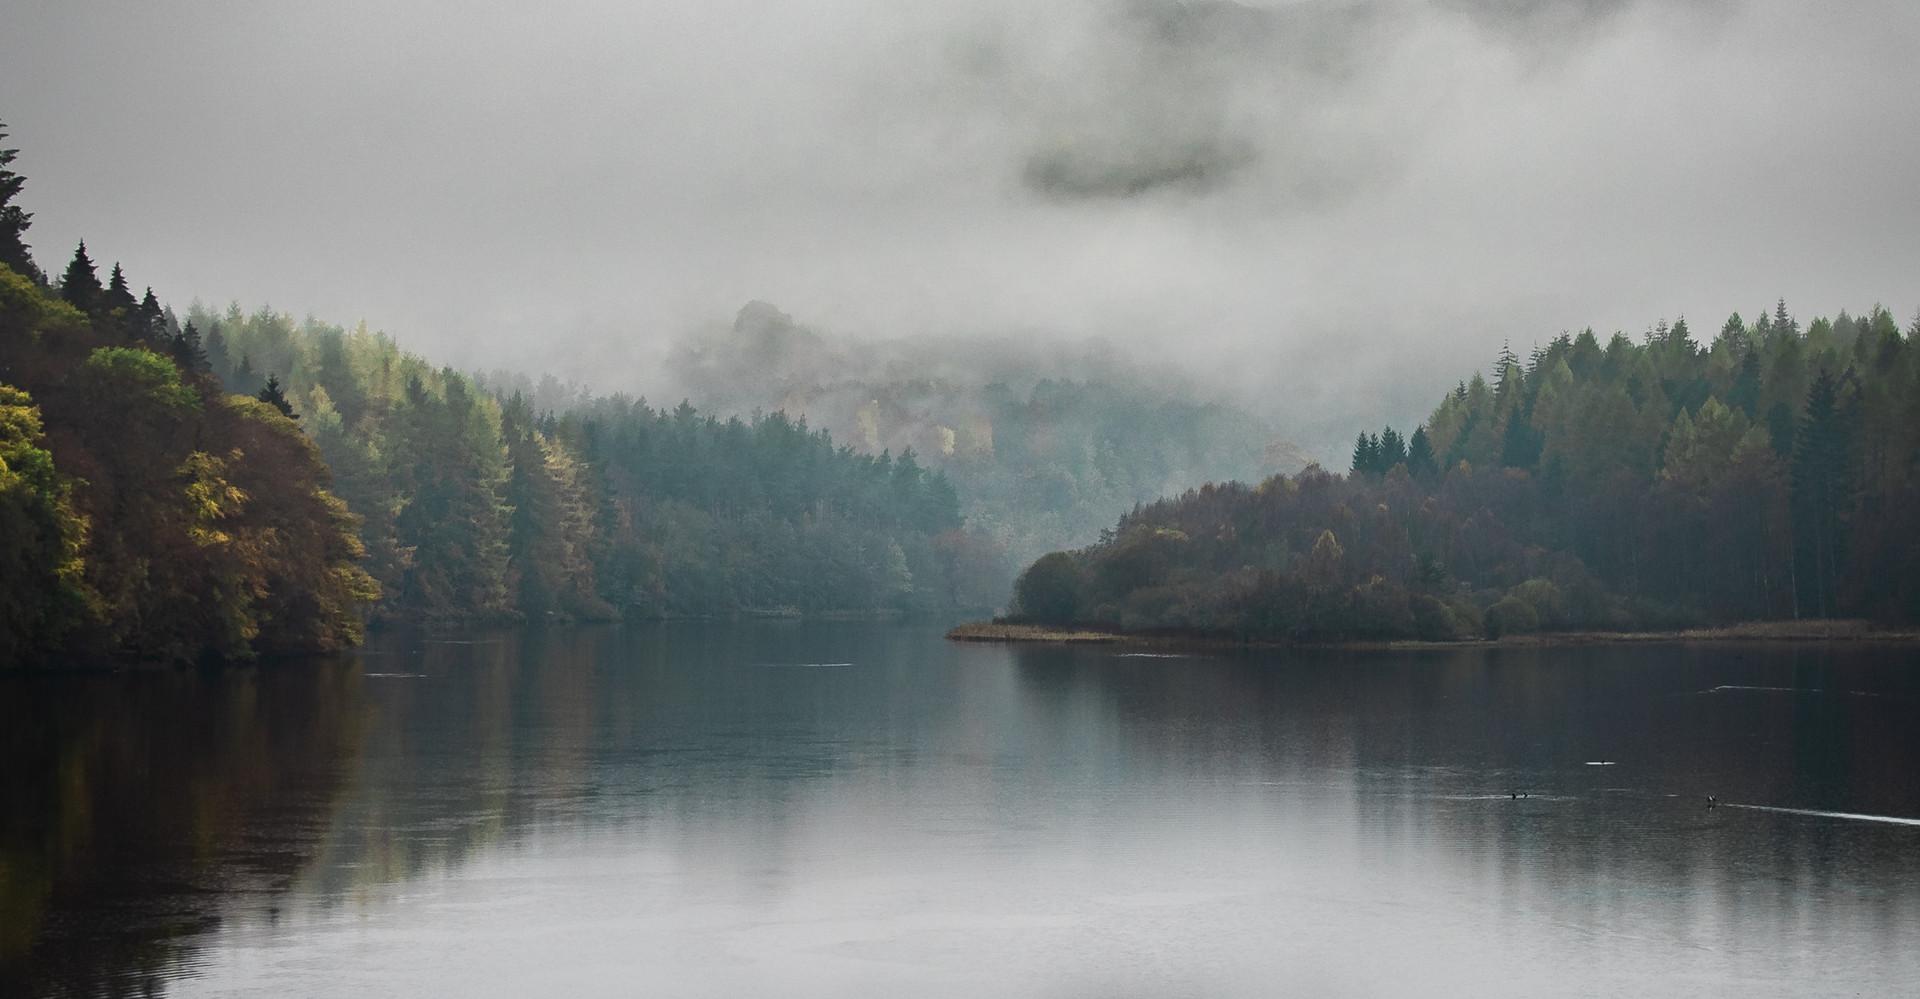 Misty Loch in Perthshire